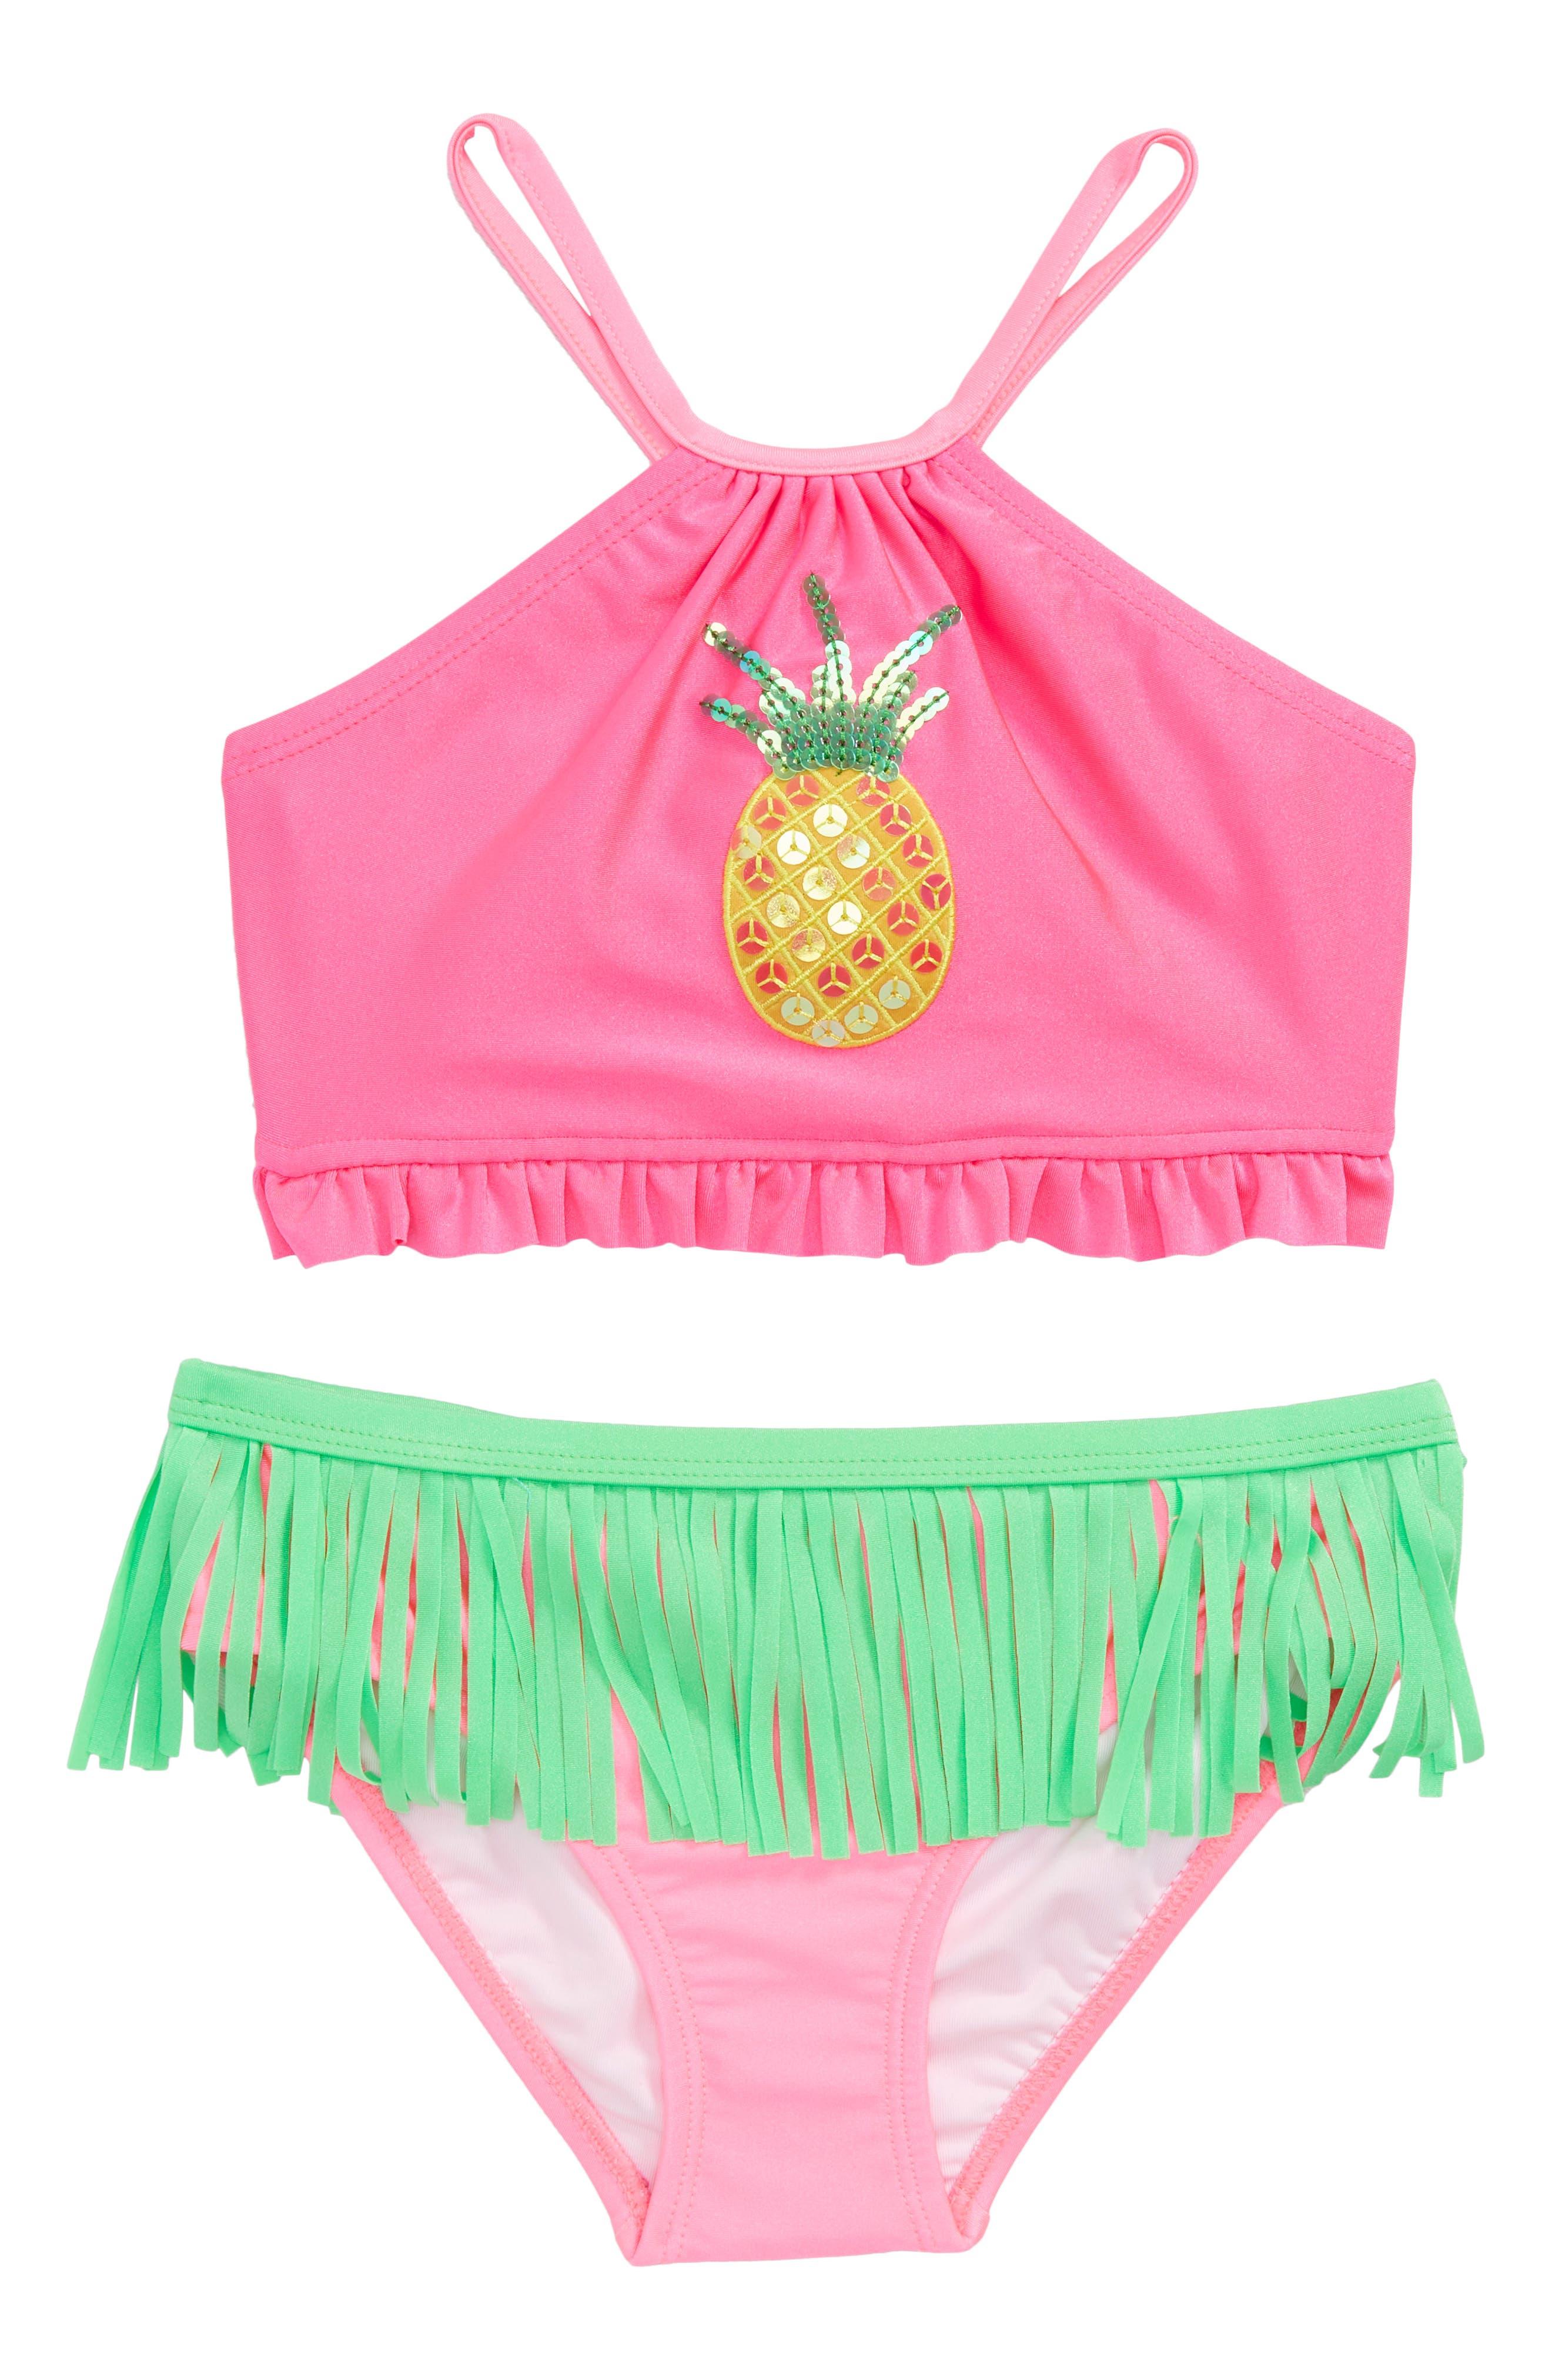 Alternate Image 1 Selected - Love U Lots Pineapple Hula Two-Piece Bikini Swimsuit (Toddler Girls & Little Girls)